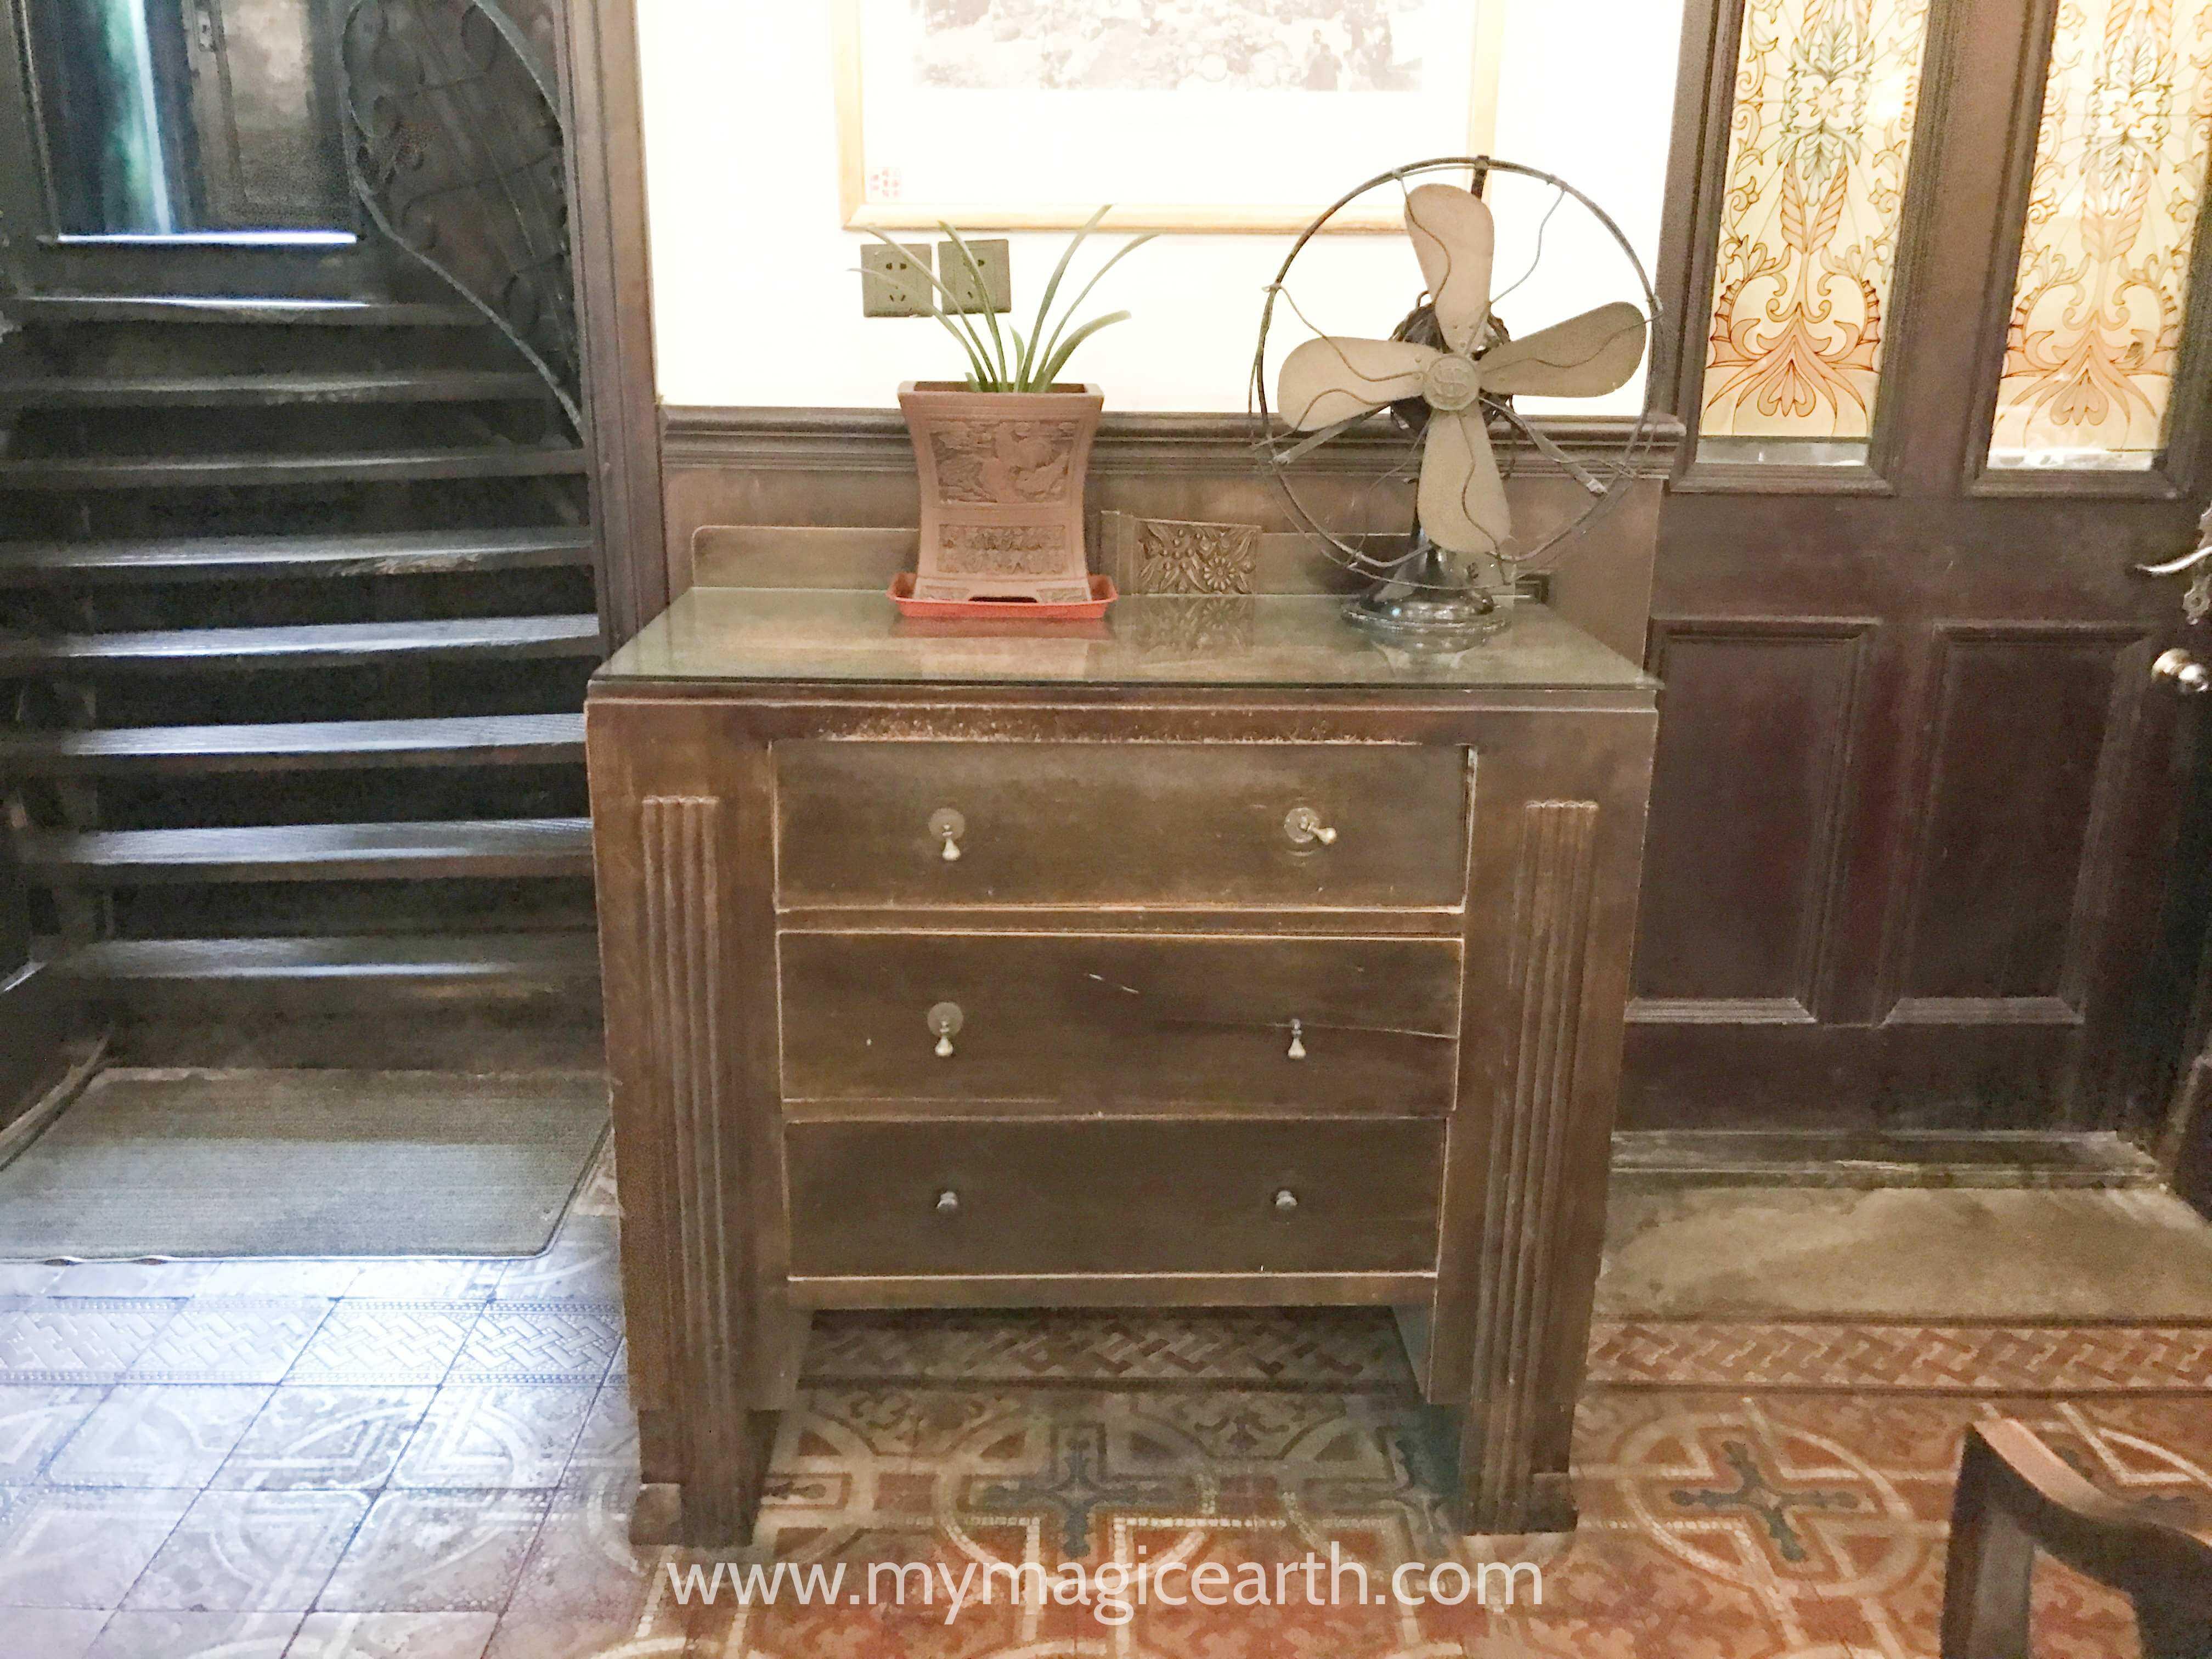 Old furniture inside the Notre Dame